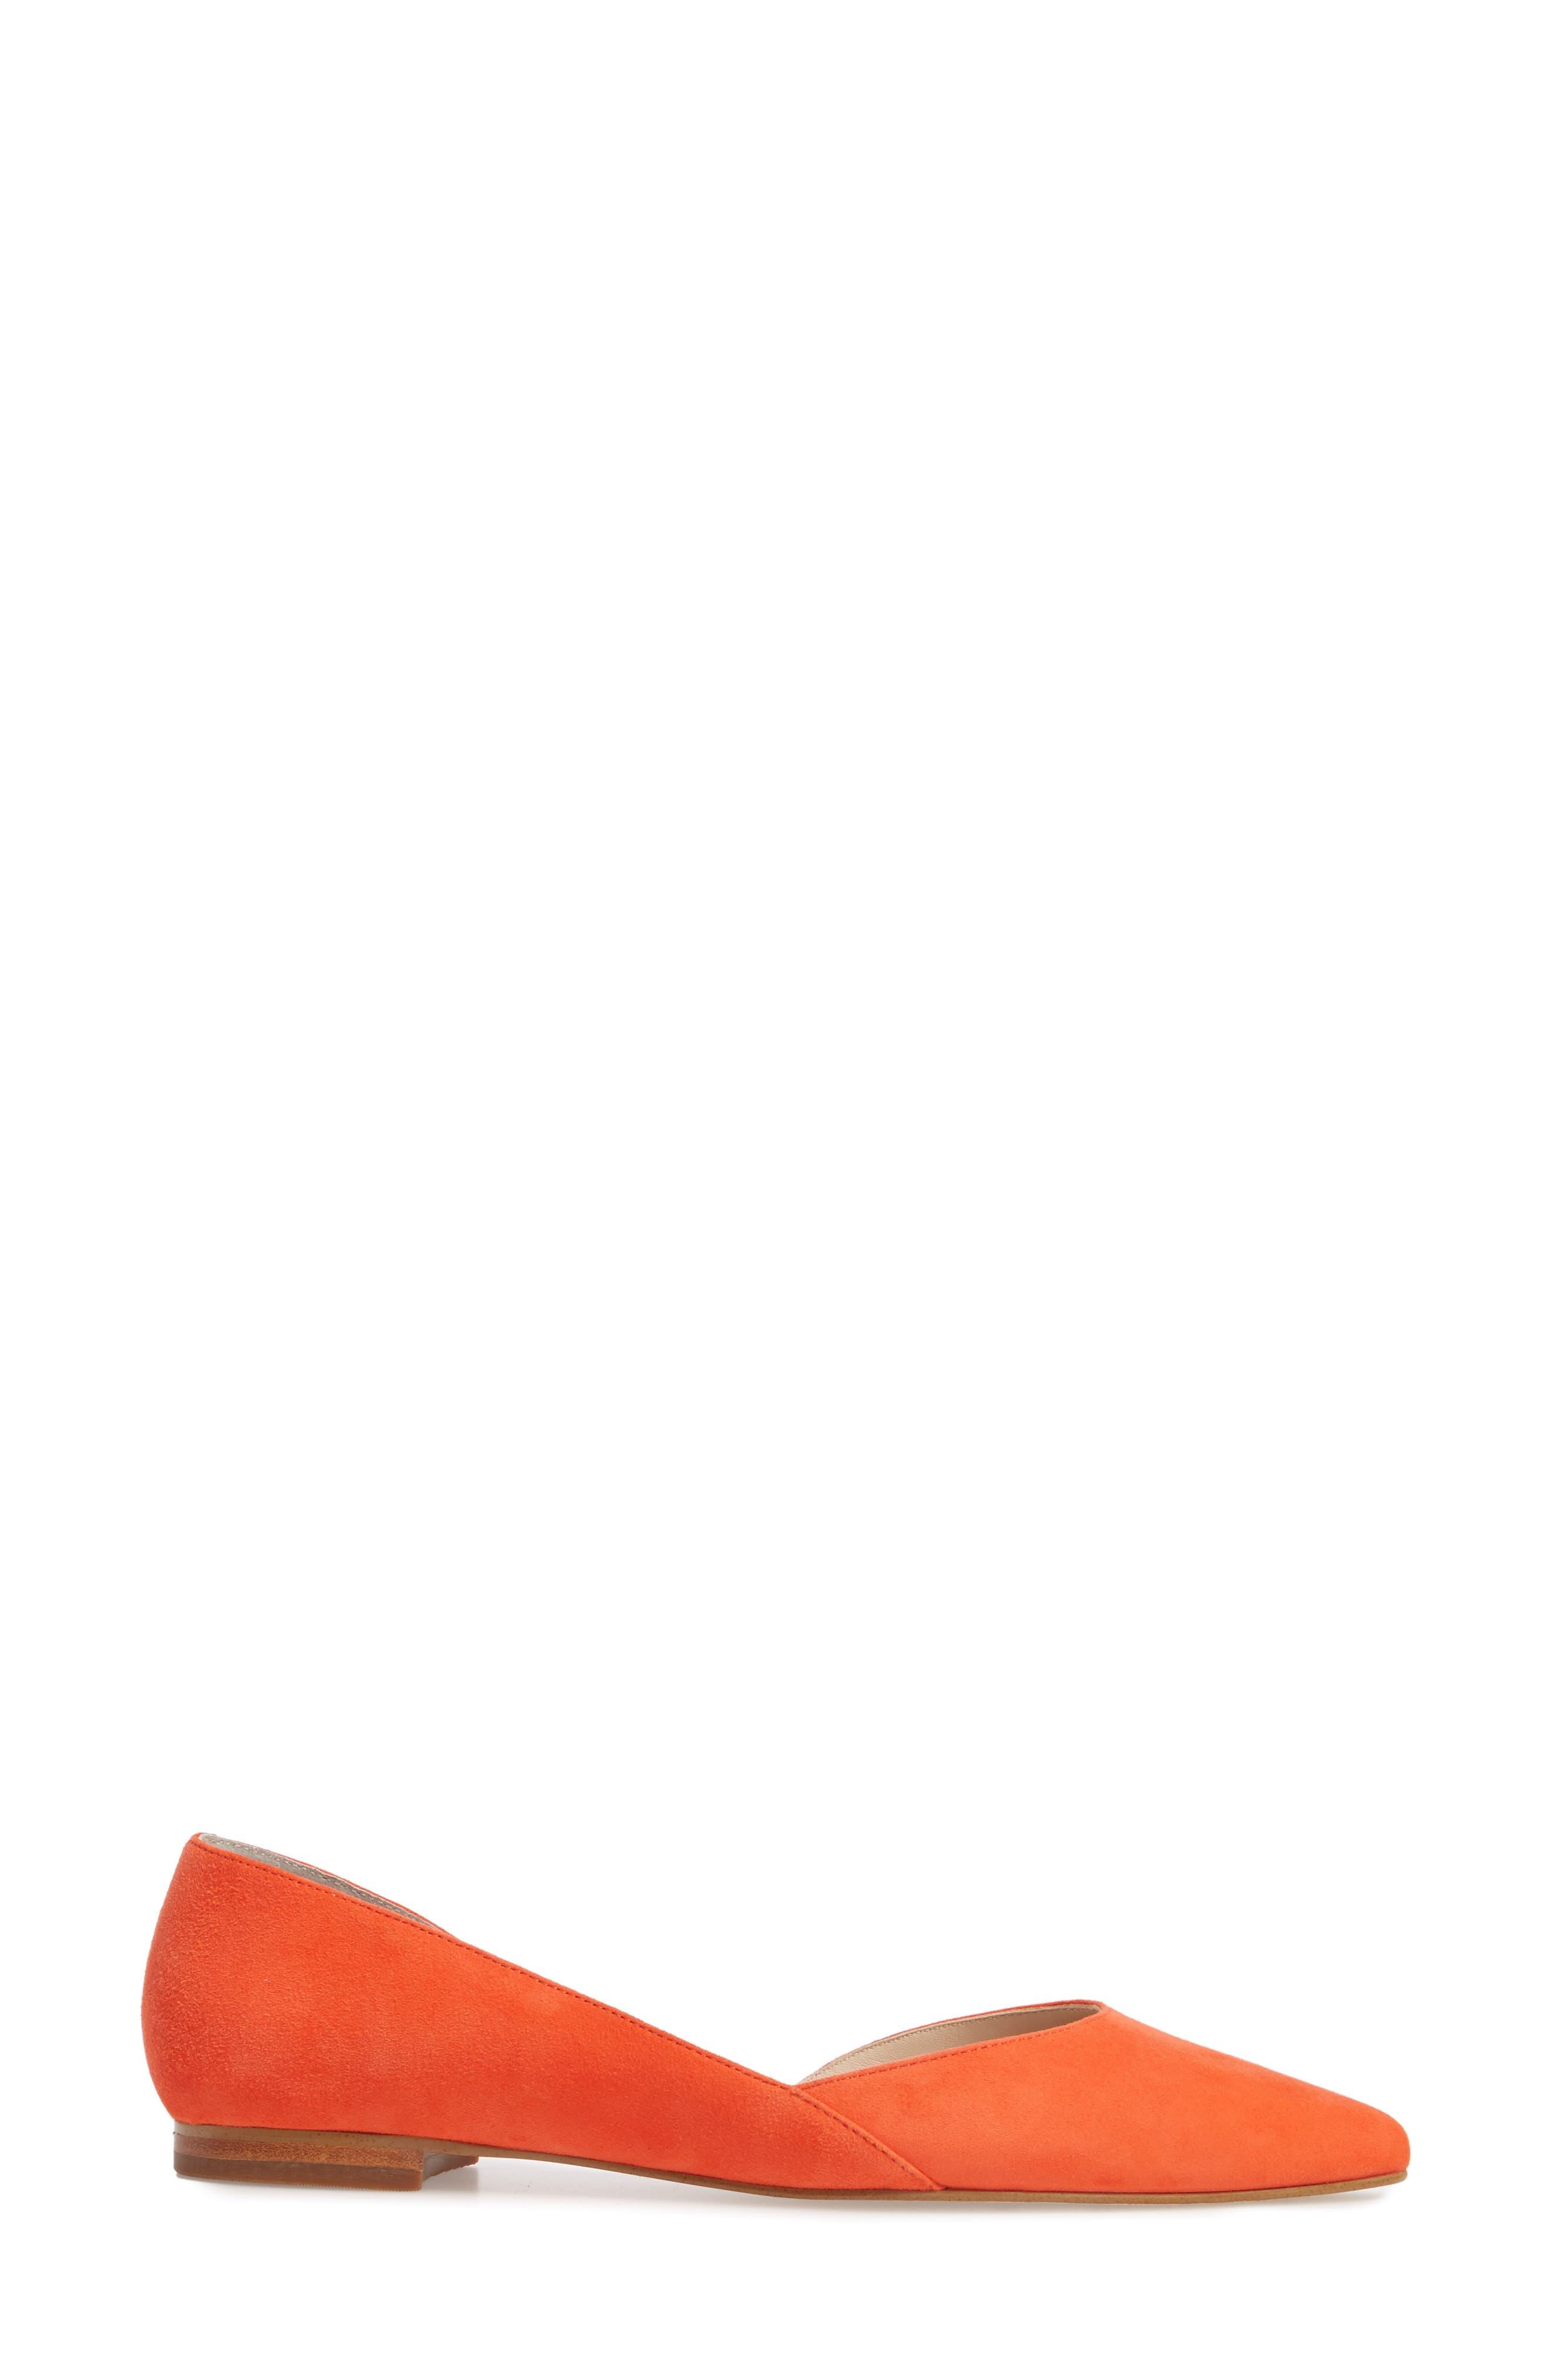 'Sunny' Half d'Orsay Flat,                             Alternate thumbnail 114, color,